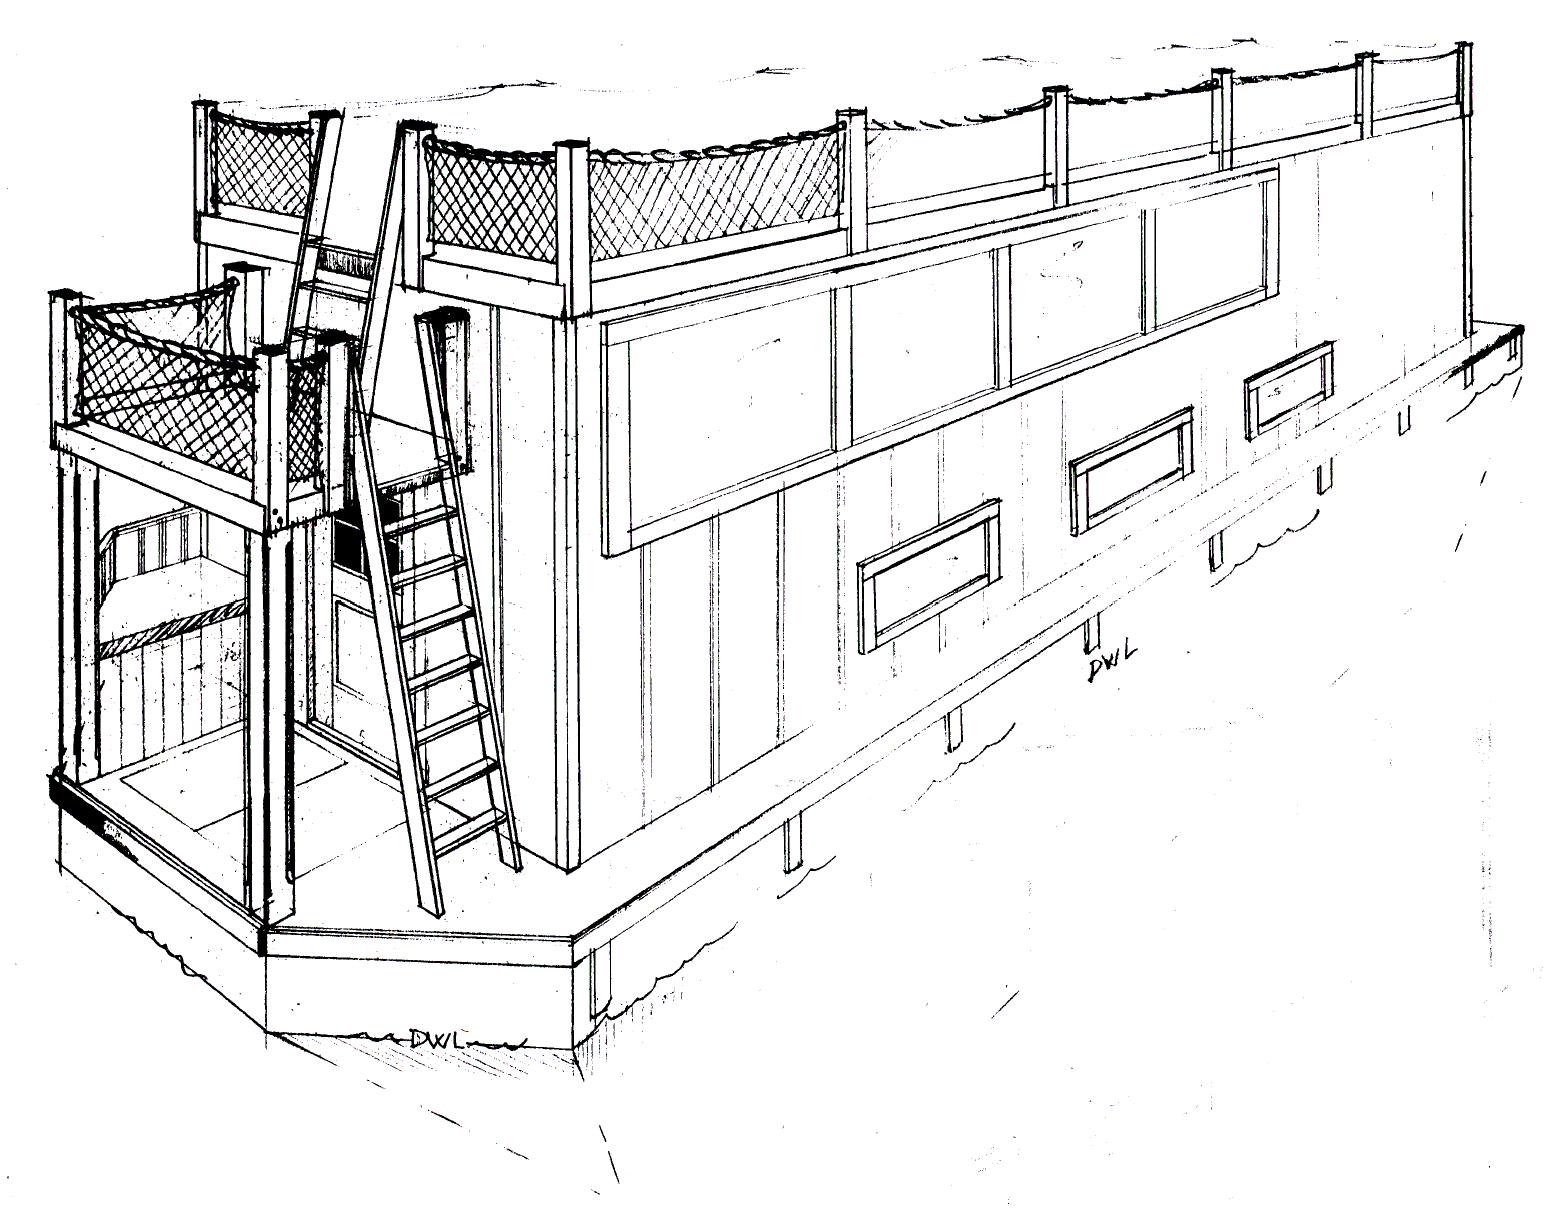 36' Houseboat - DRIFTER - Kasten Marine Design, Inc.